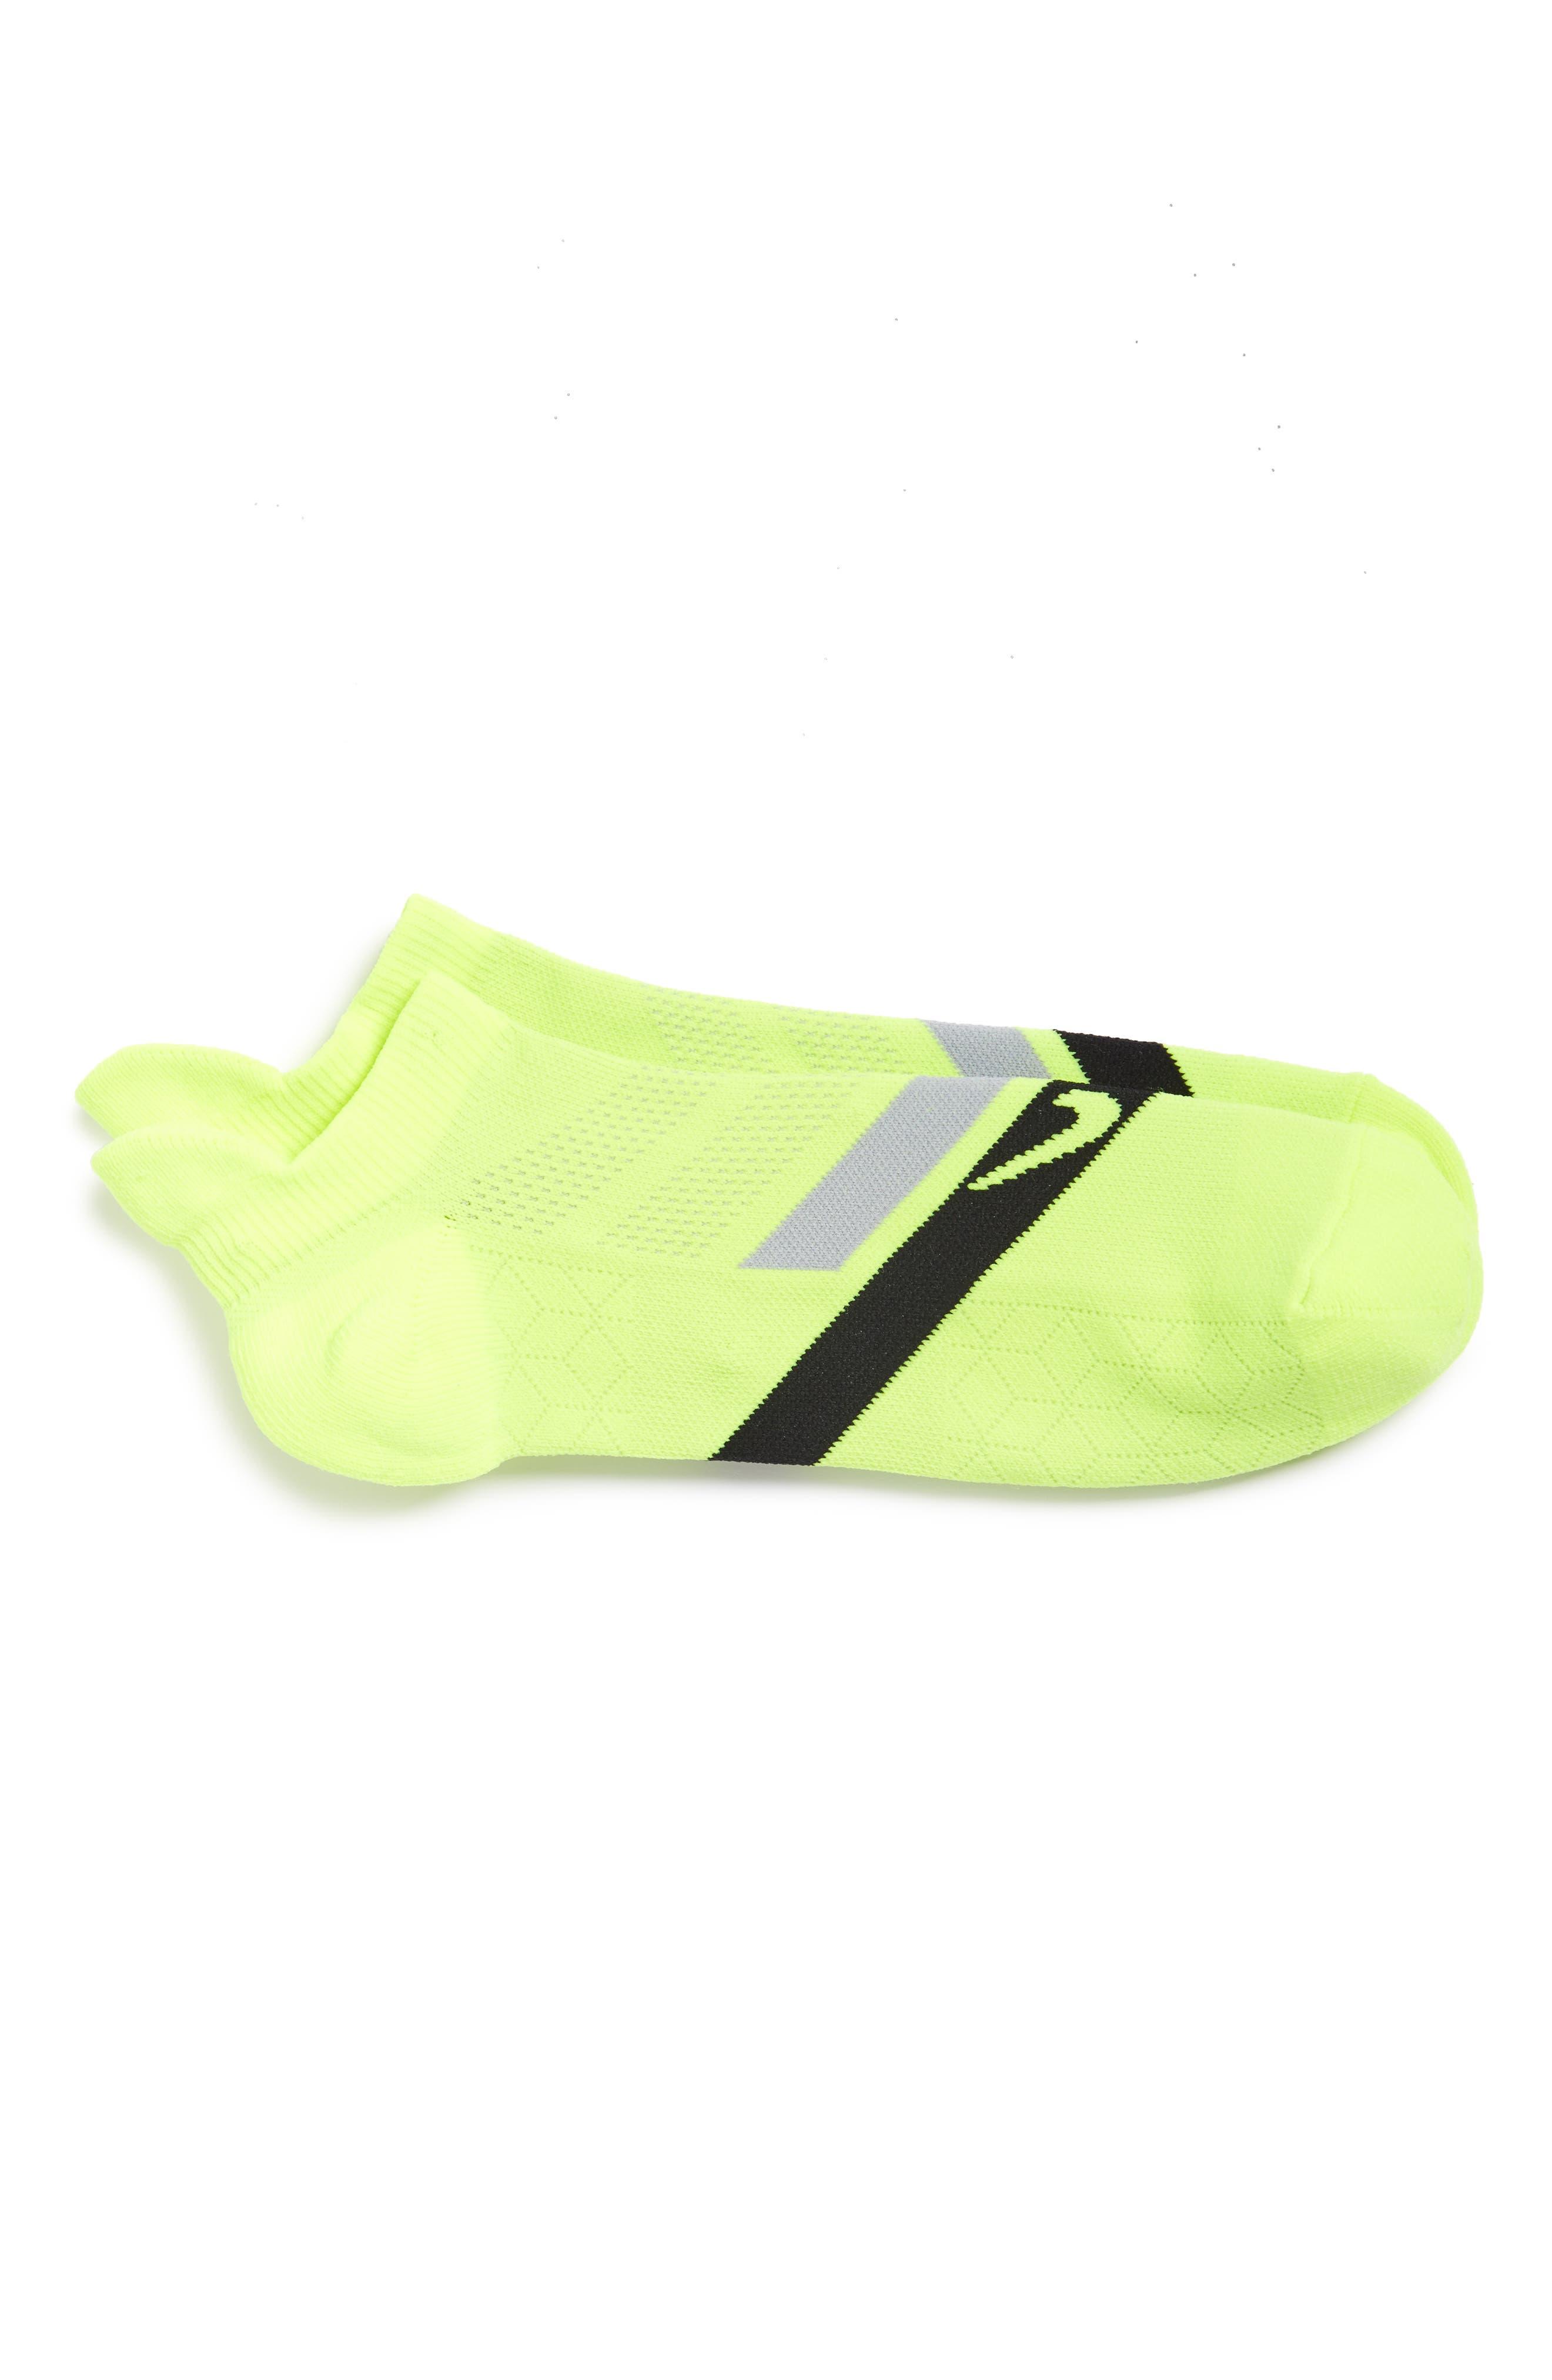 Main Image - Nike Performance Cushion No-Show Socks